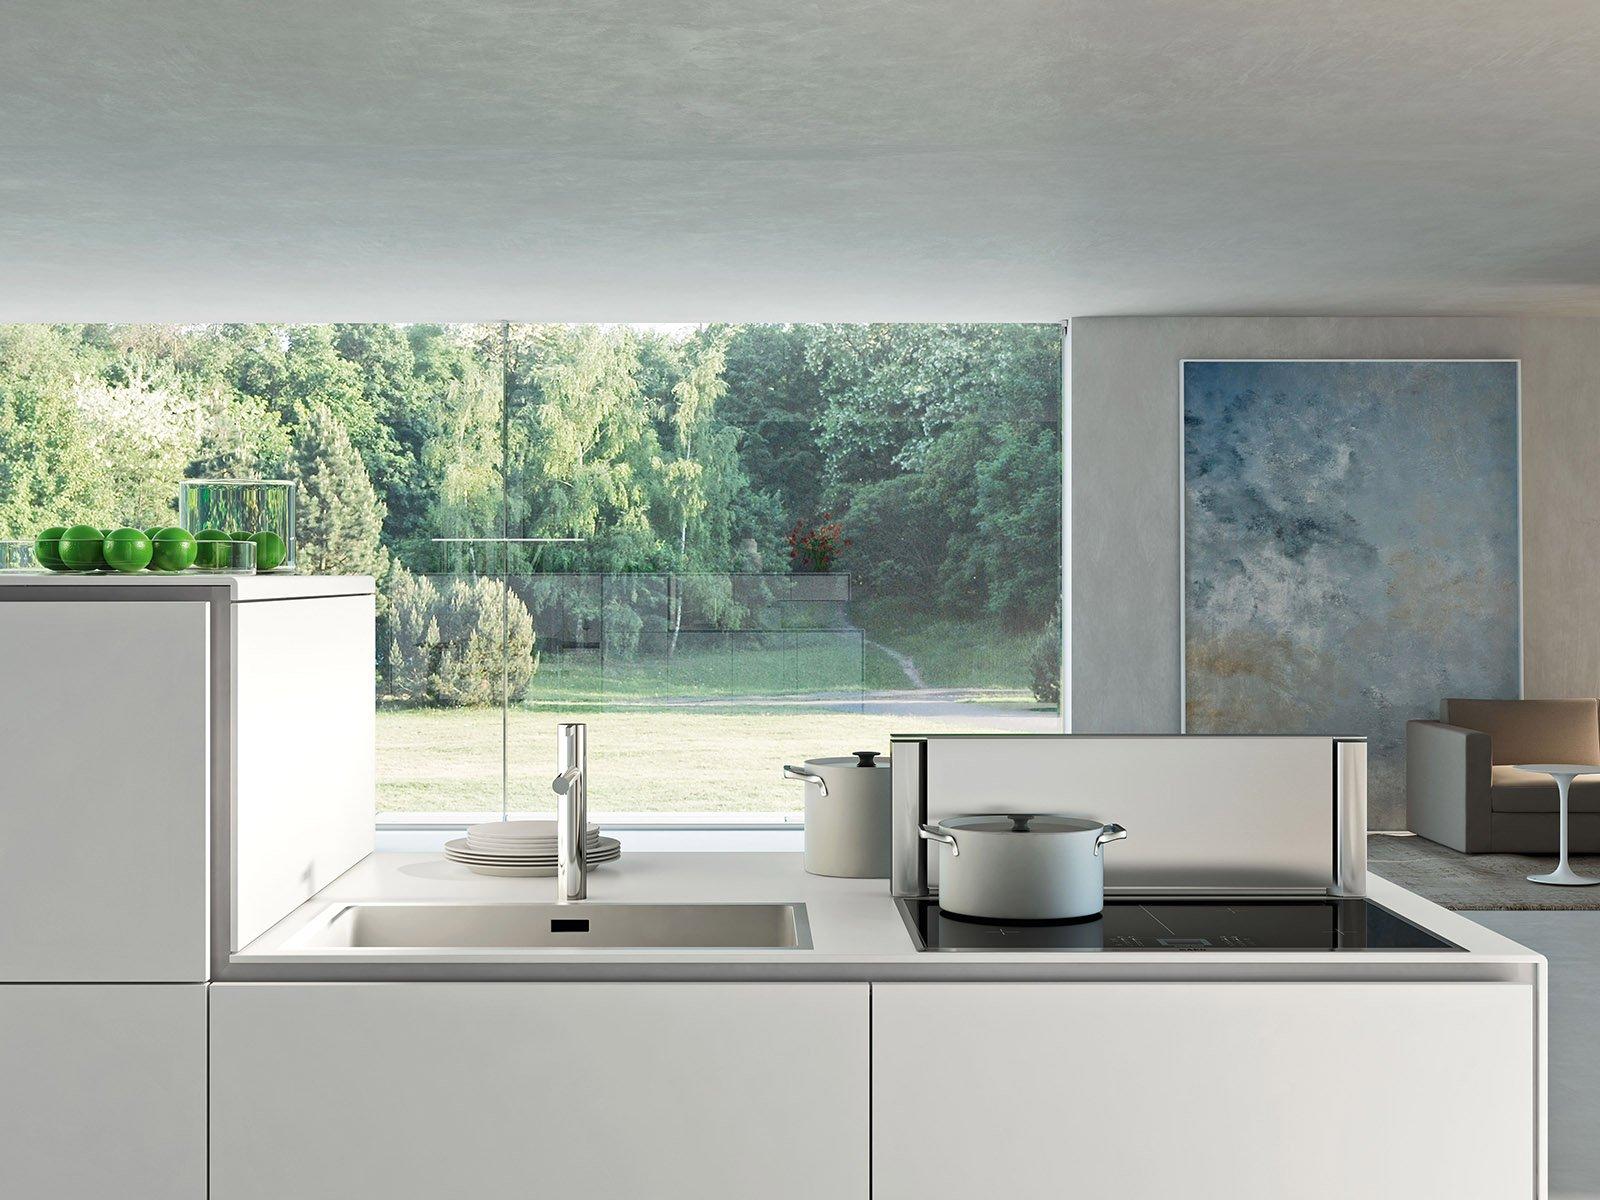 Good design award vince la cucina mimetizzata cose di casa - Cucina a elle ...